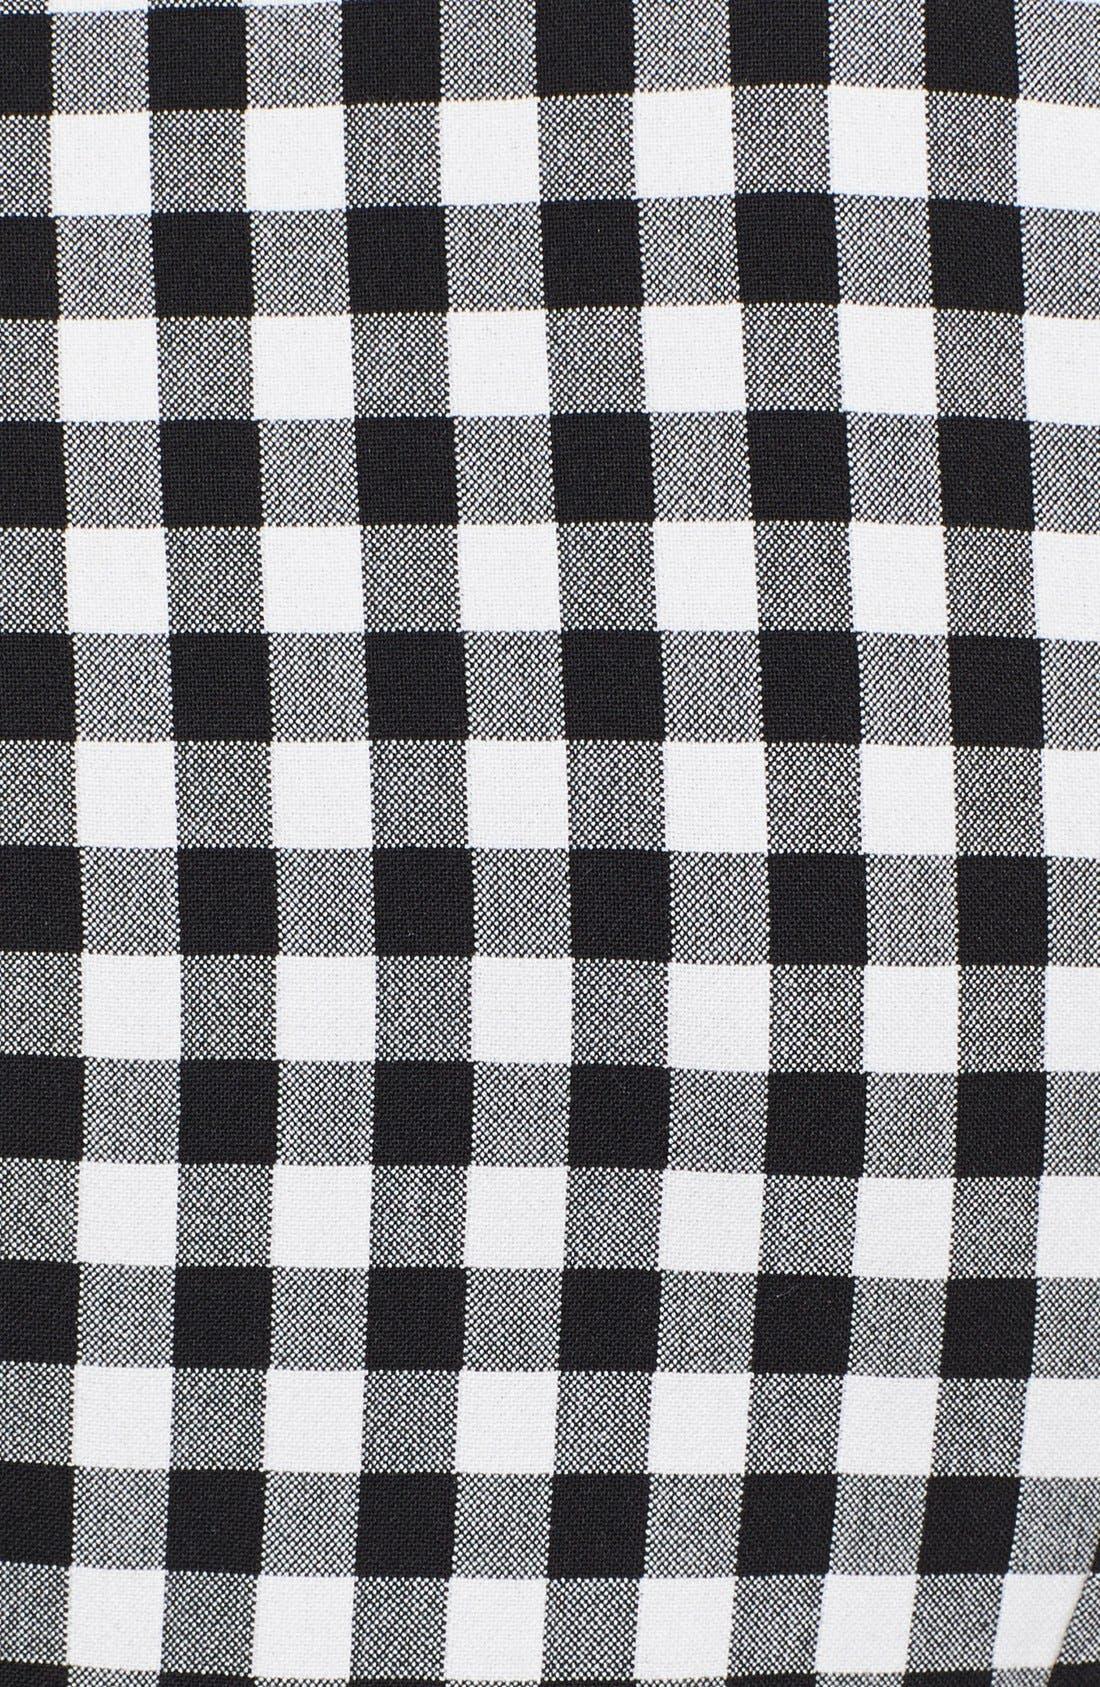 'Genesis' Gingham Pants,                             Alternate thumbnail 3, color,                             Black/ White